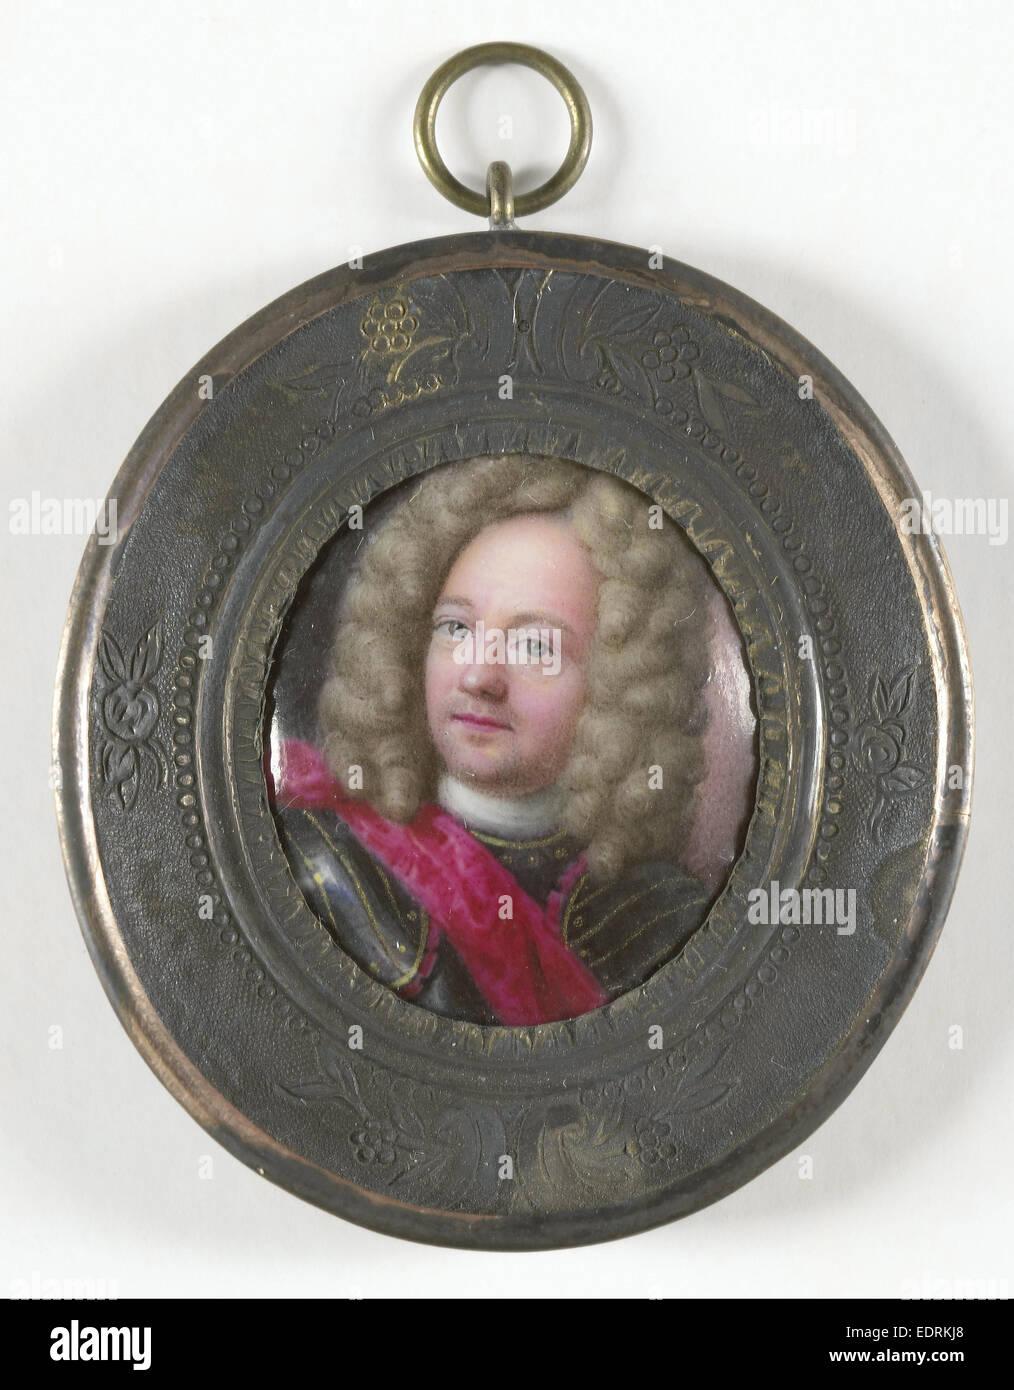 John Churchill, 1650-1722, Duke of Marlborough, attributed to Johann Friedrich Ardin, 1700 - 1725, Portrait miniature - Stock Image